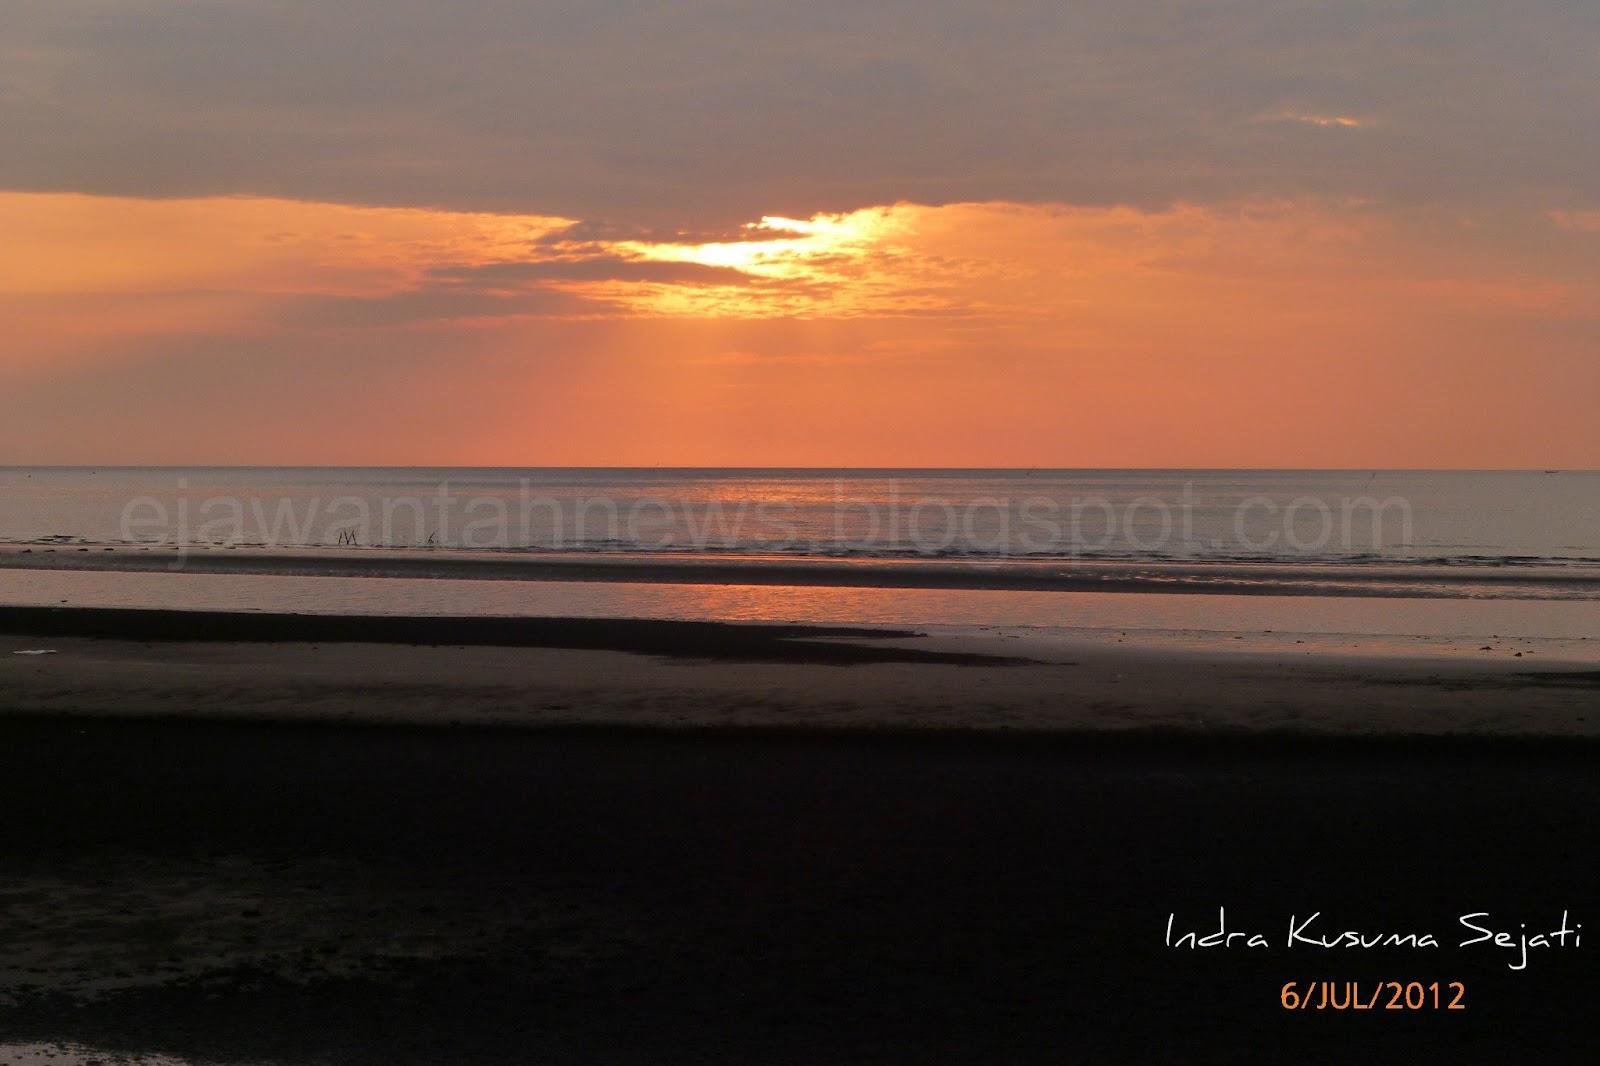 http://ejawantahnews.blogspot.com/2011/11/logika-keajaiban-mimpi.html